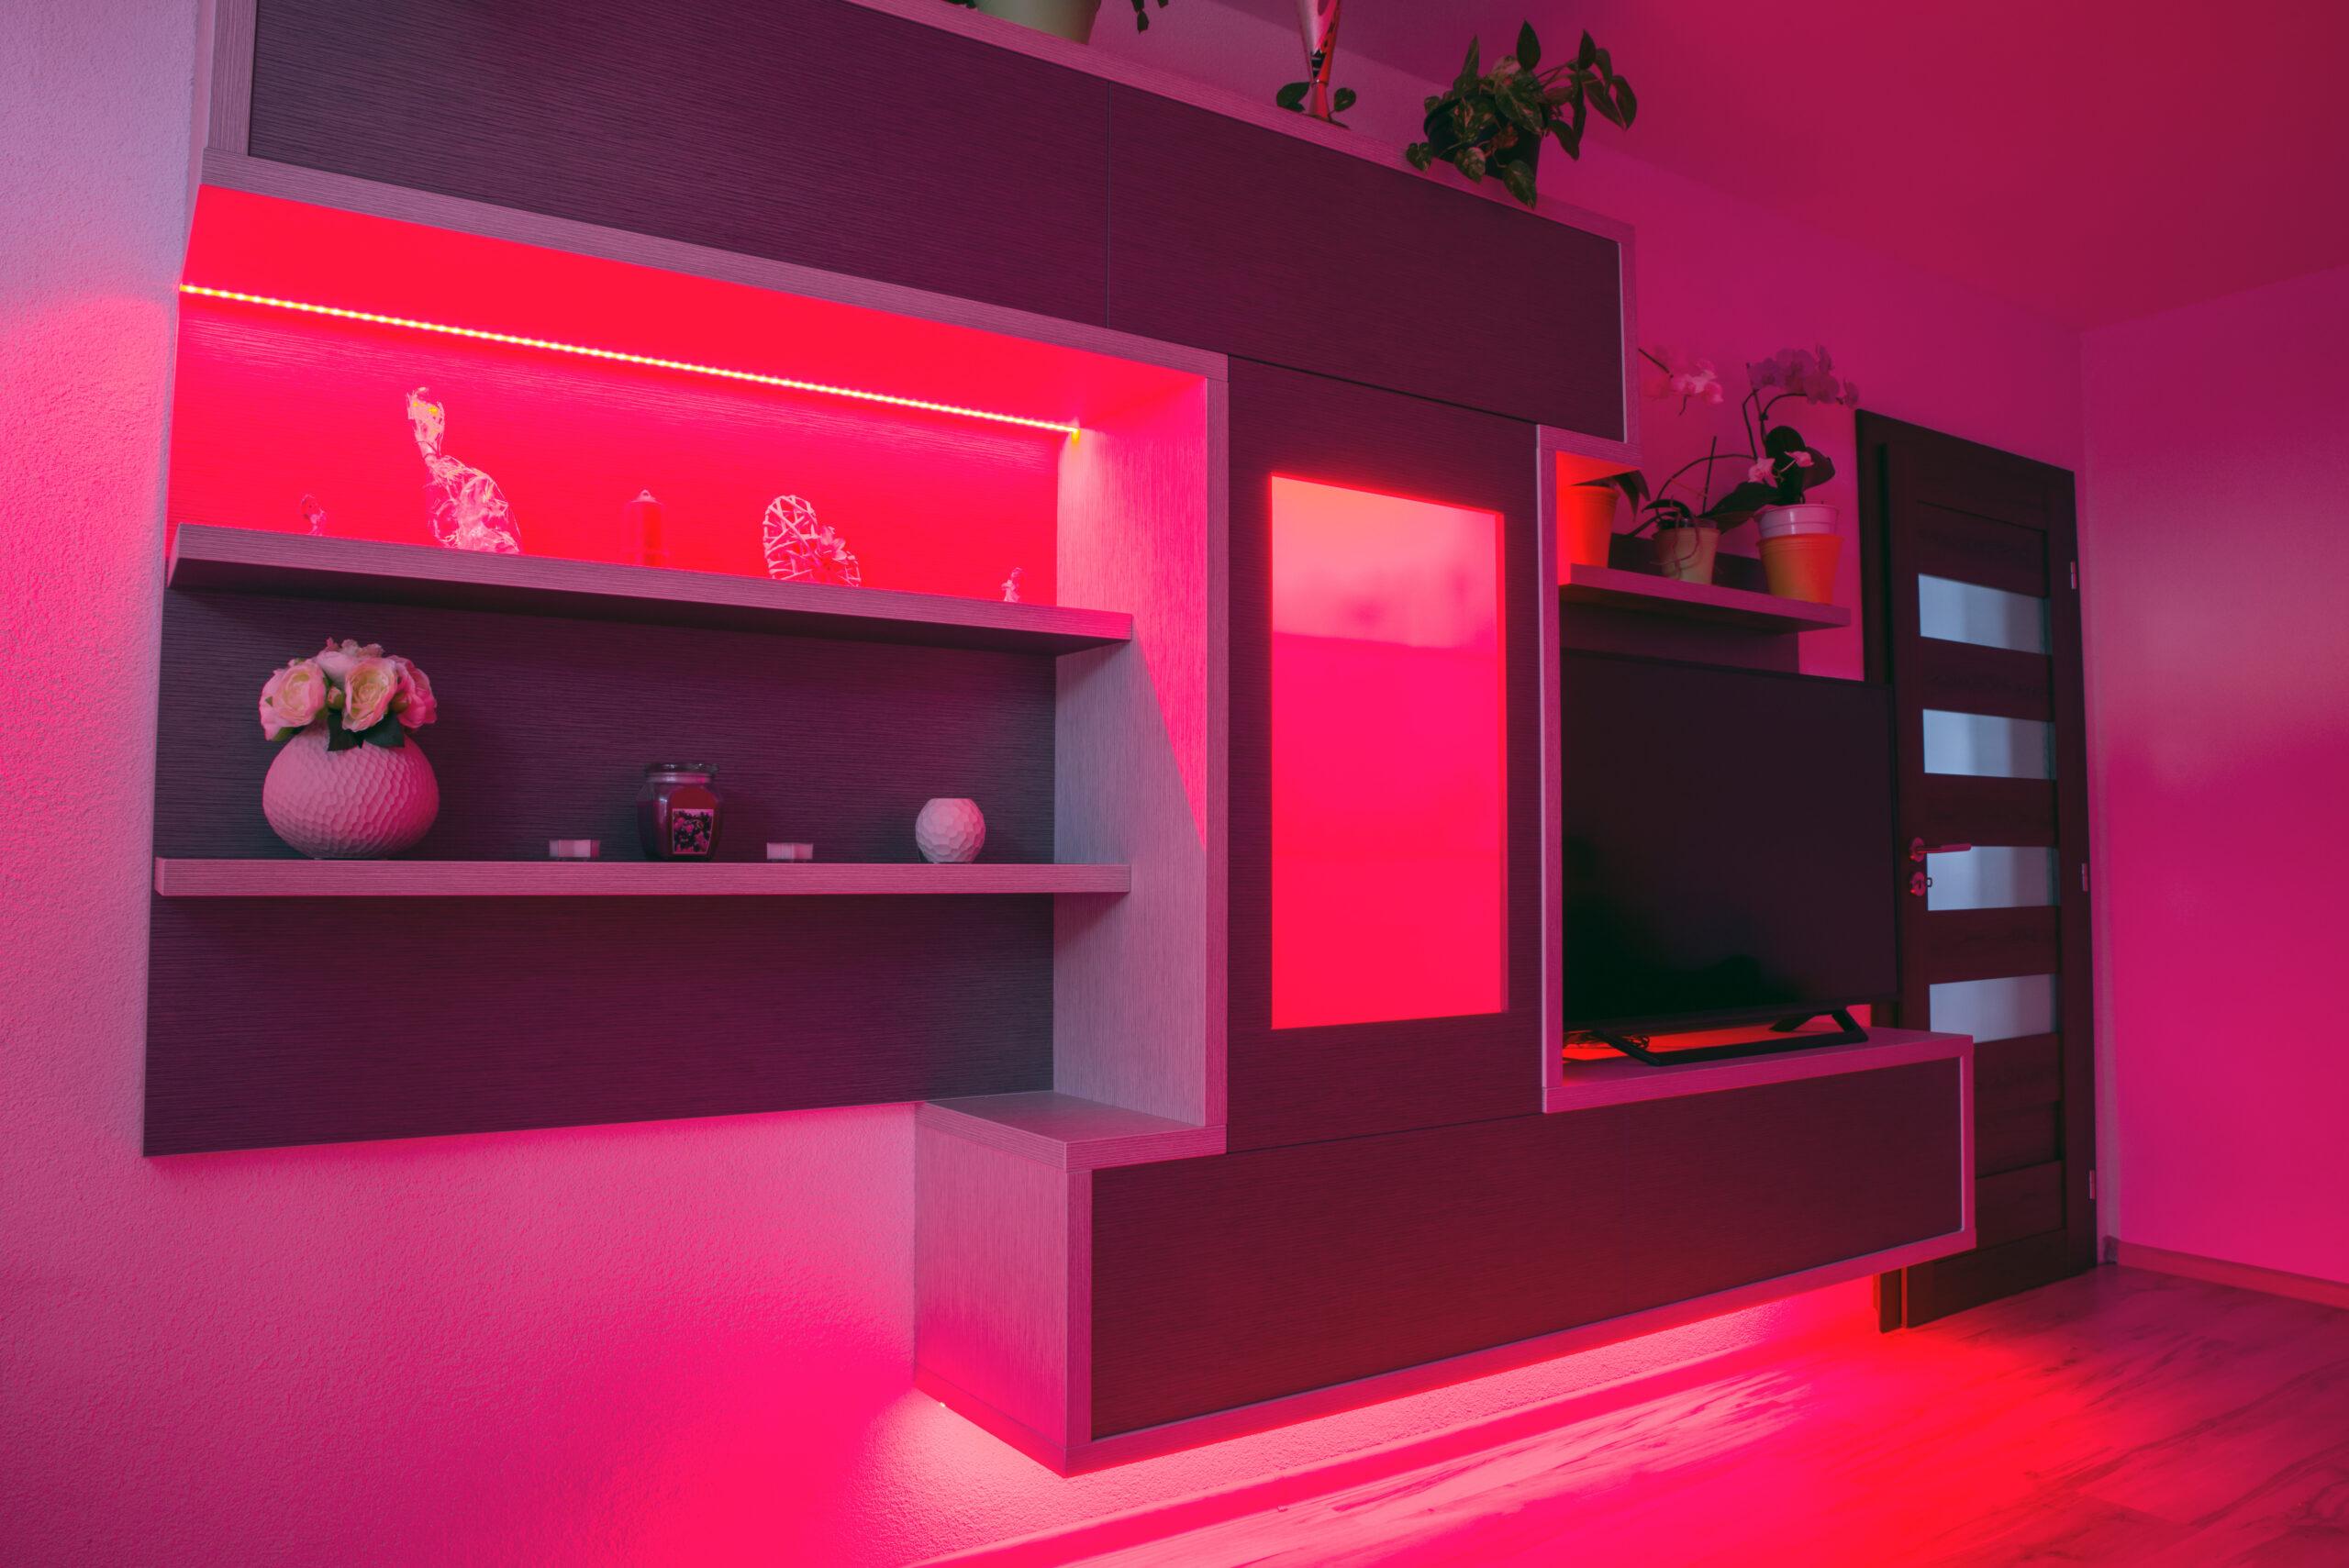 Modern designed furniture in living room with led backlight